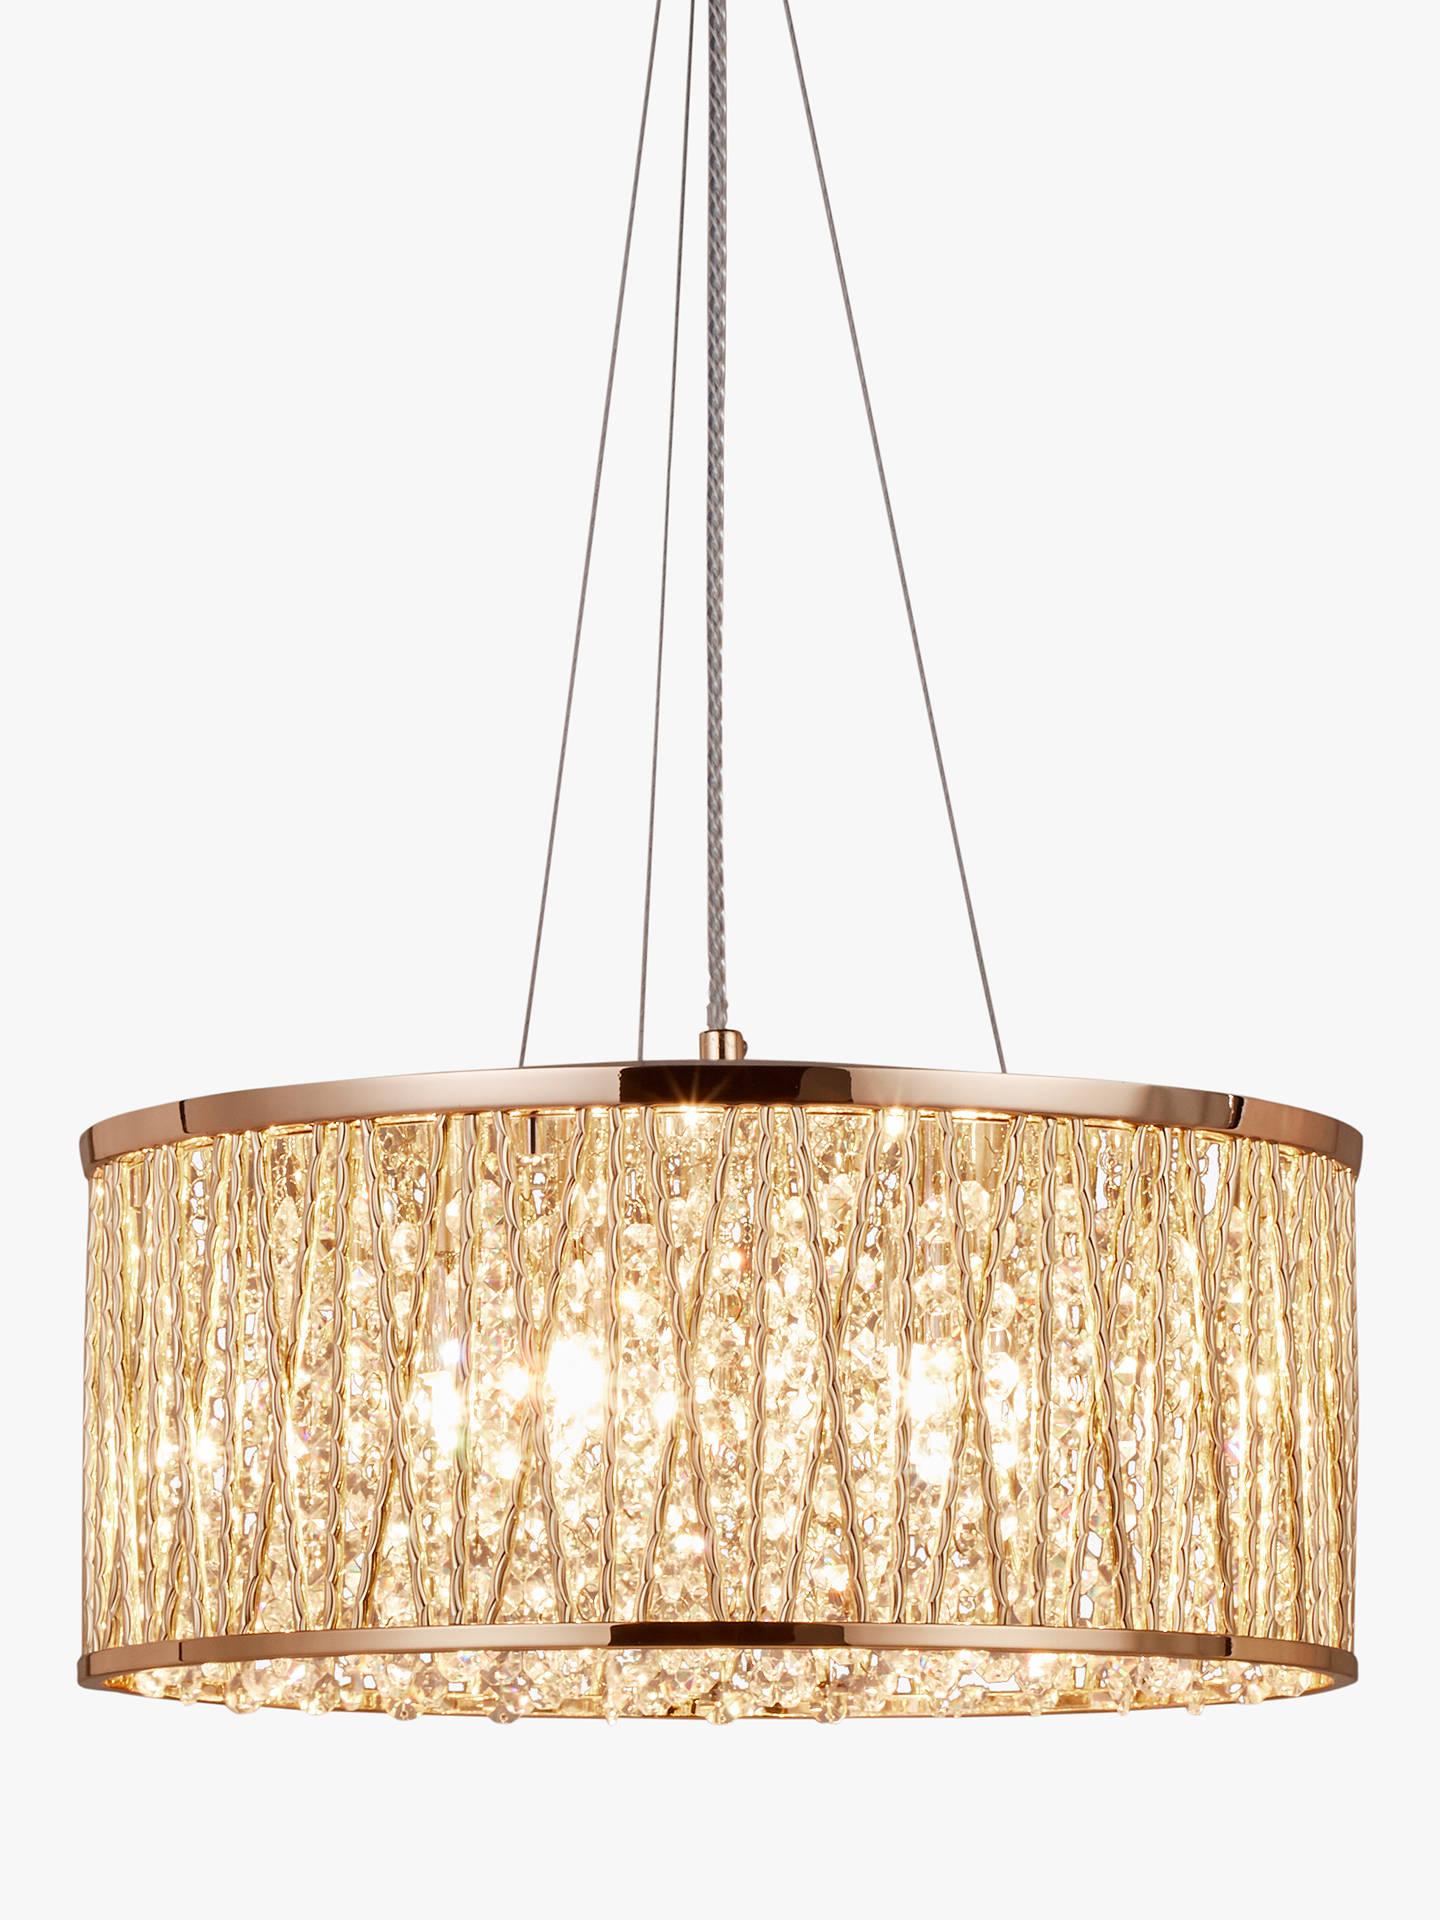 Buy john lewis partners emilia large crystal ceiling light gold online at johnlewis